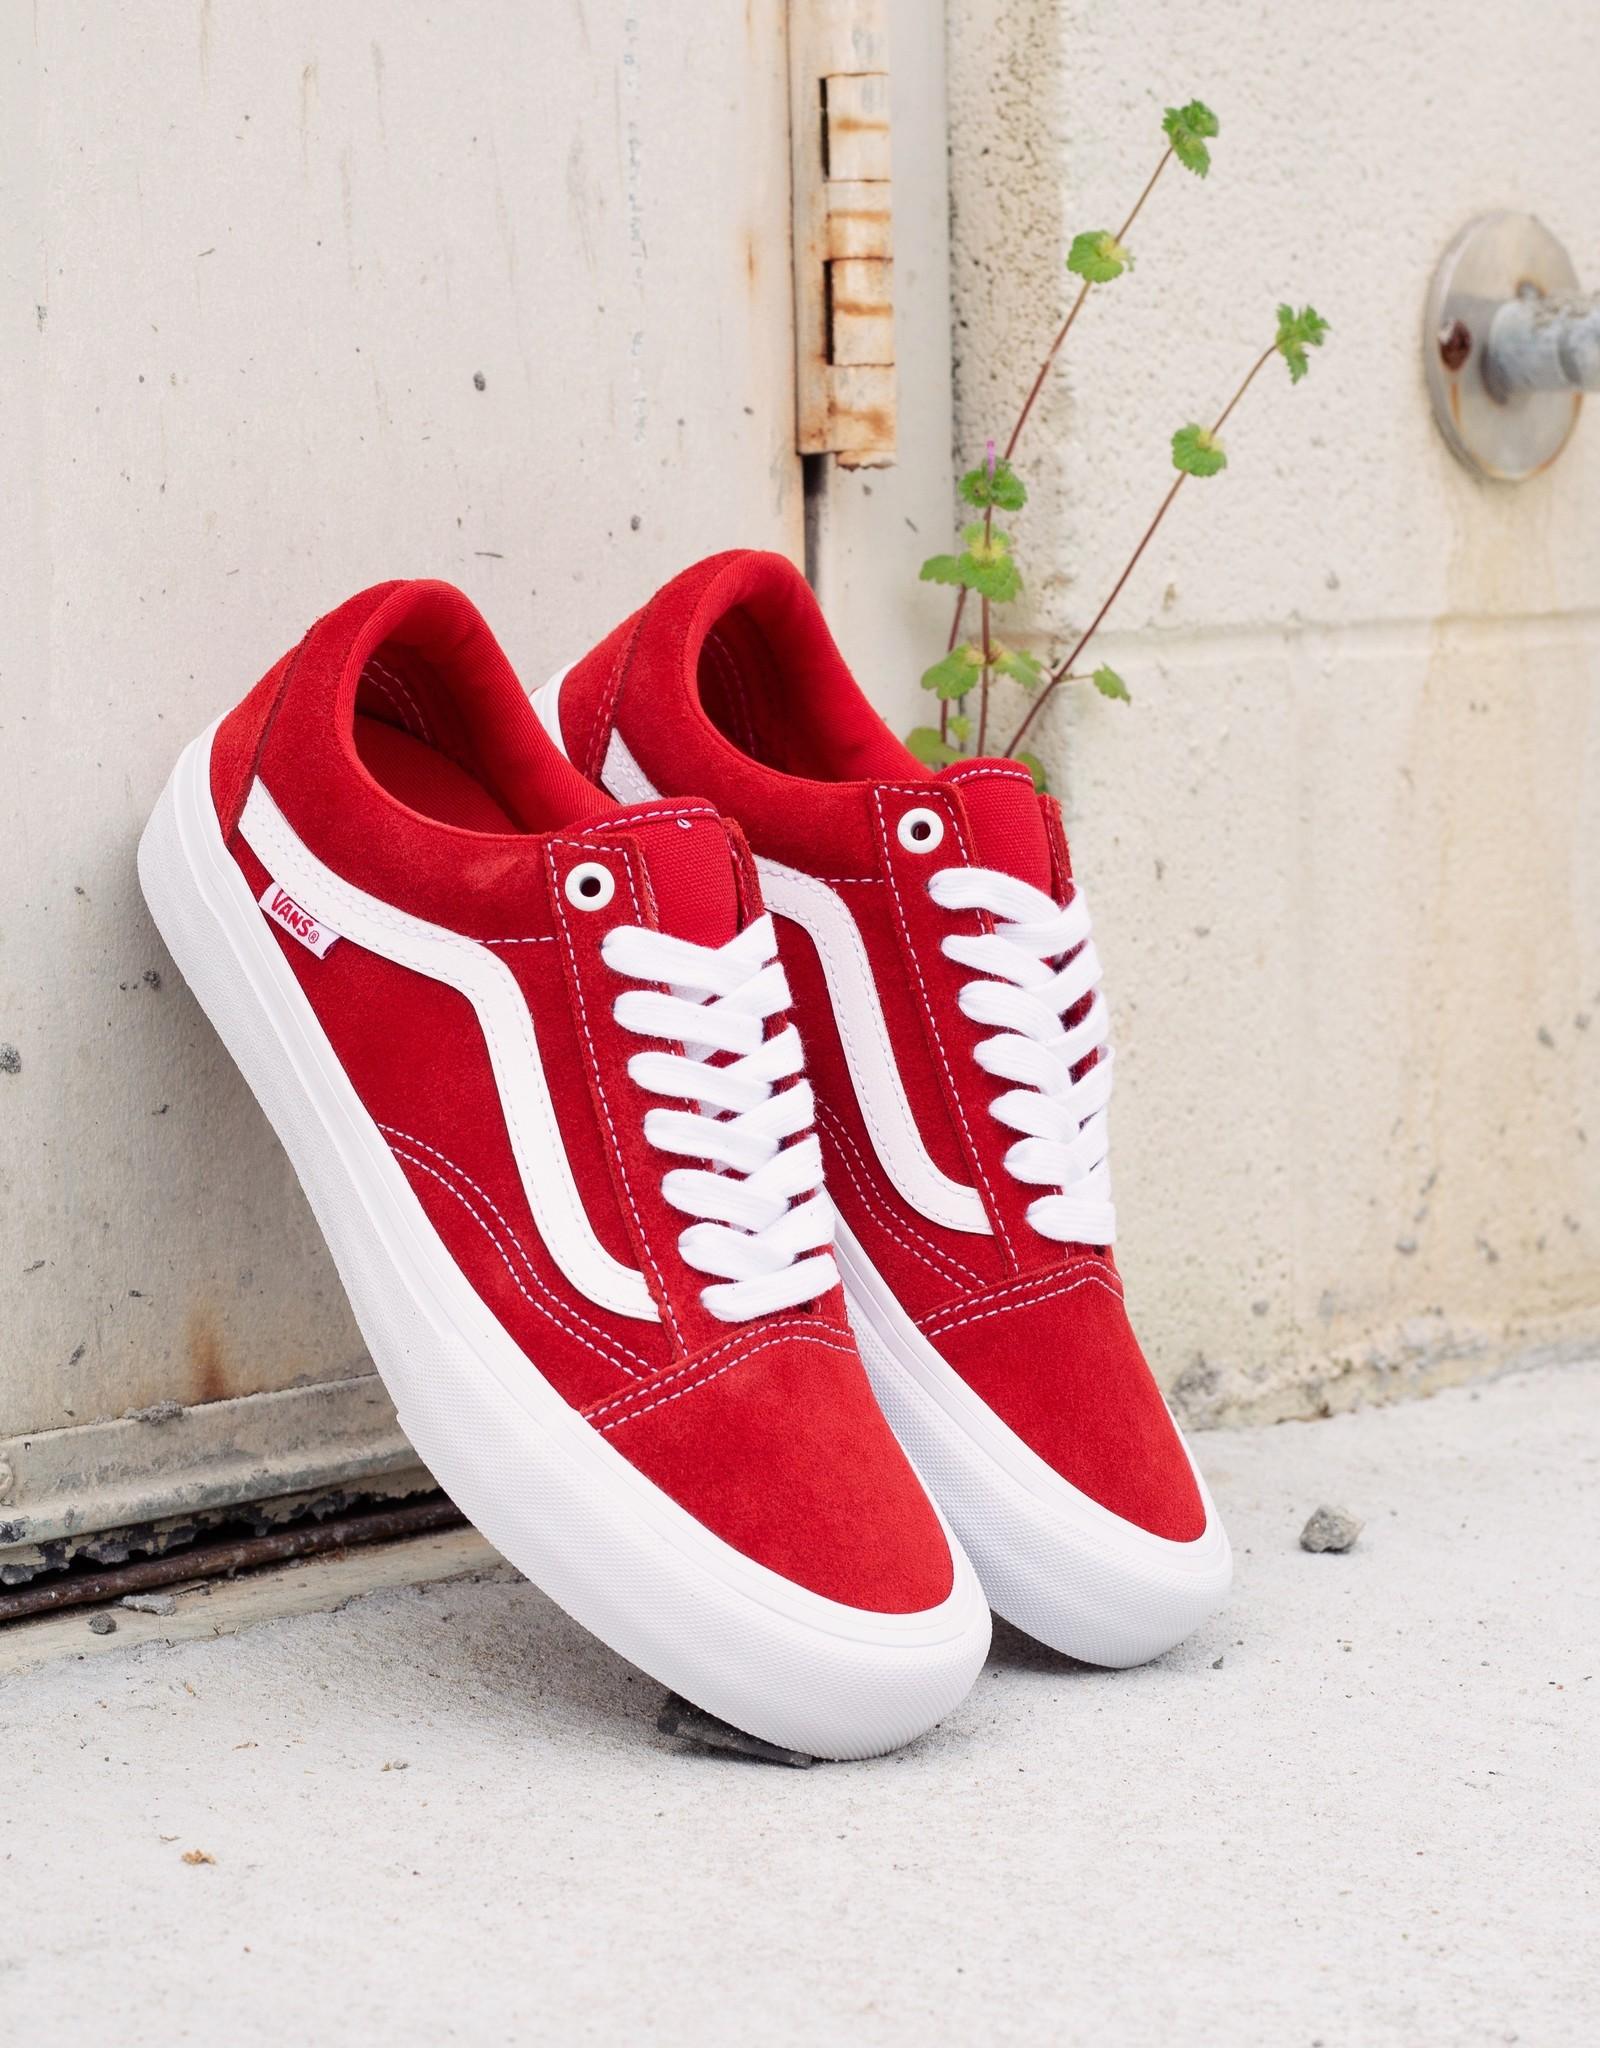 Vans Old Skool Pro red/white